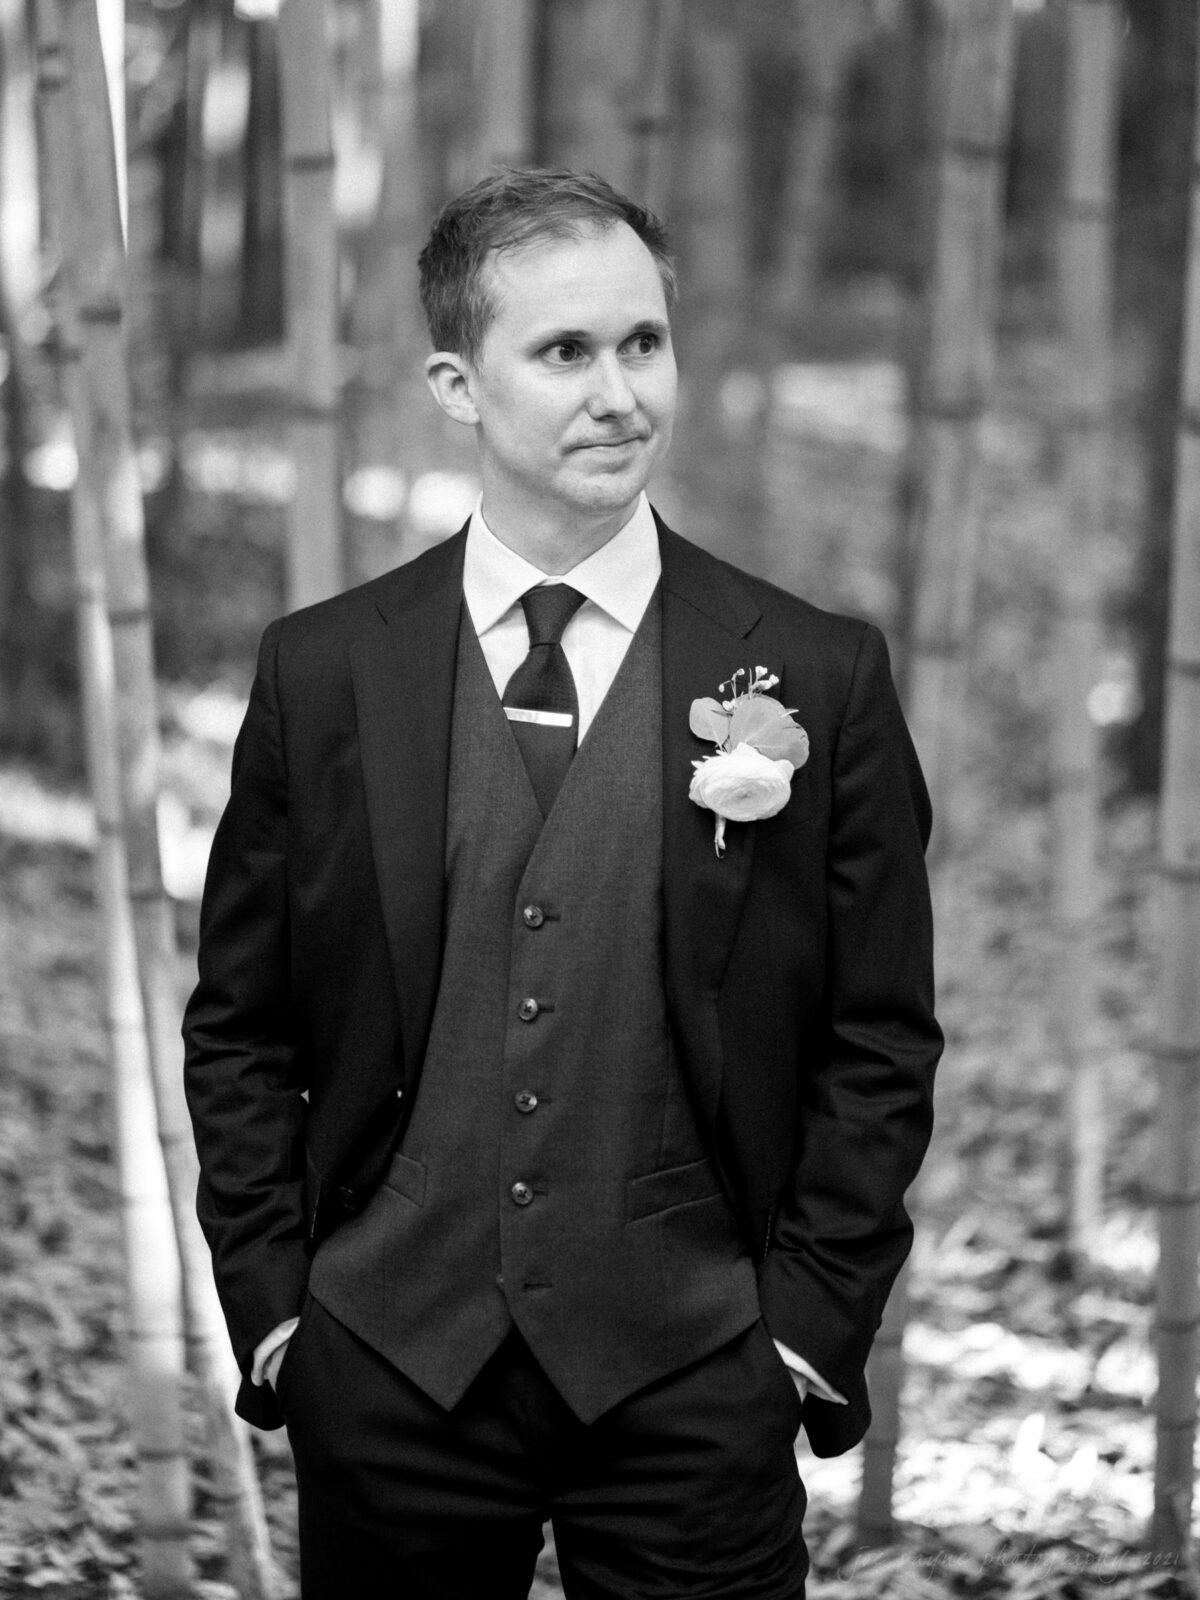 Cotton Room Wedding Photographer Kate Martin 11